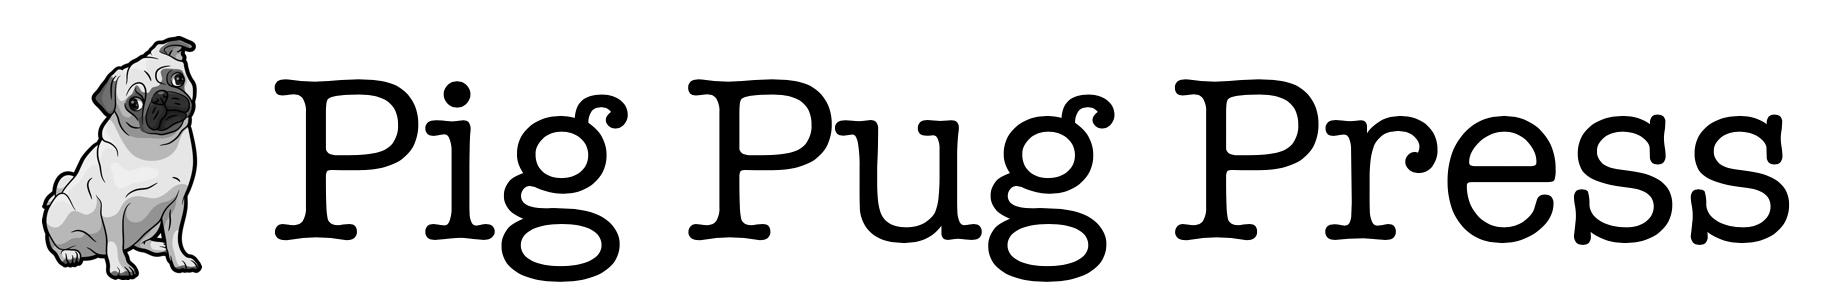 Pig Pug Press